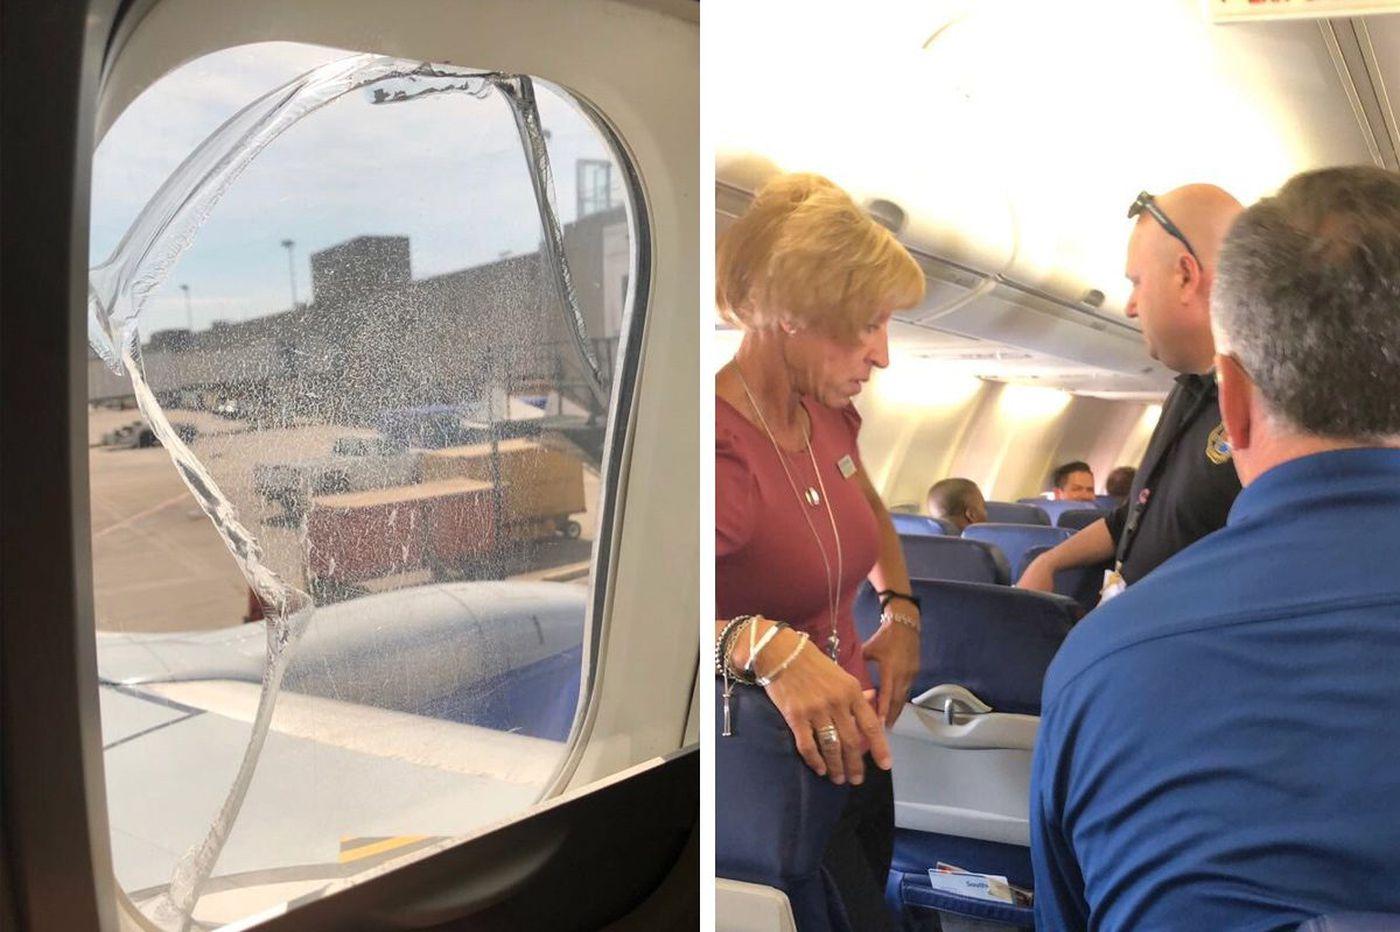 Southwest flight to Newark with cracked window diverted to Cleveland